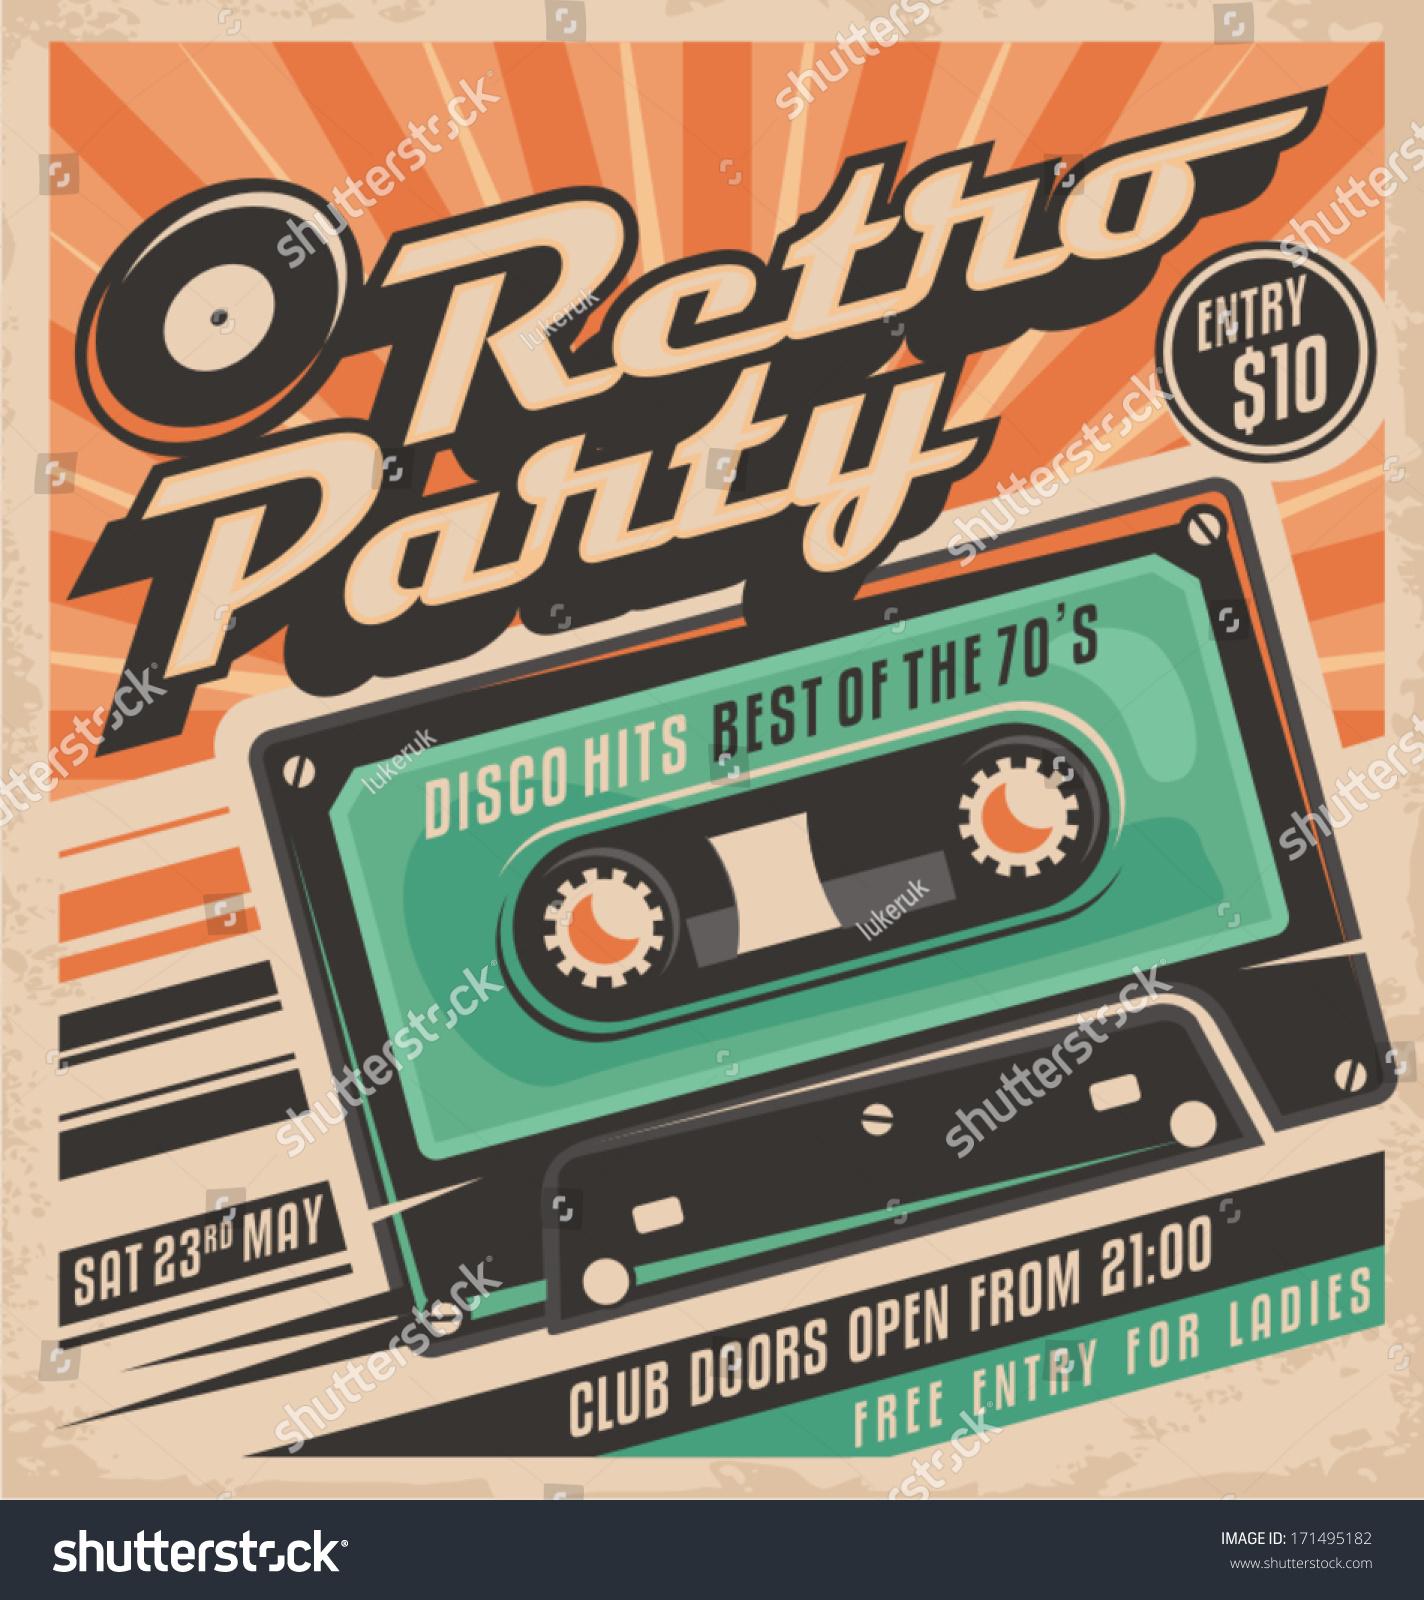 70s poster design - Retro Party Poster Design Disco Music Event At Night Club Vintage Invitation Template